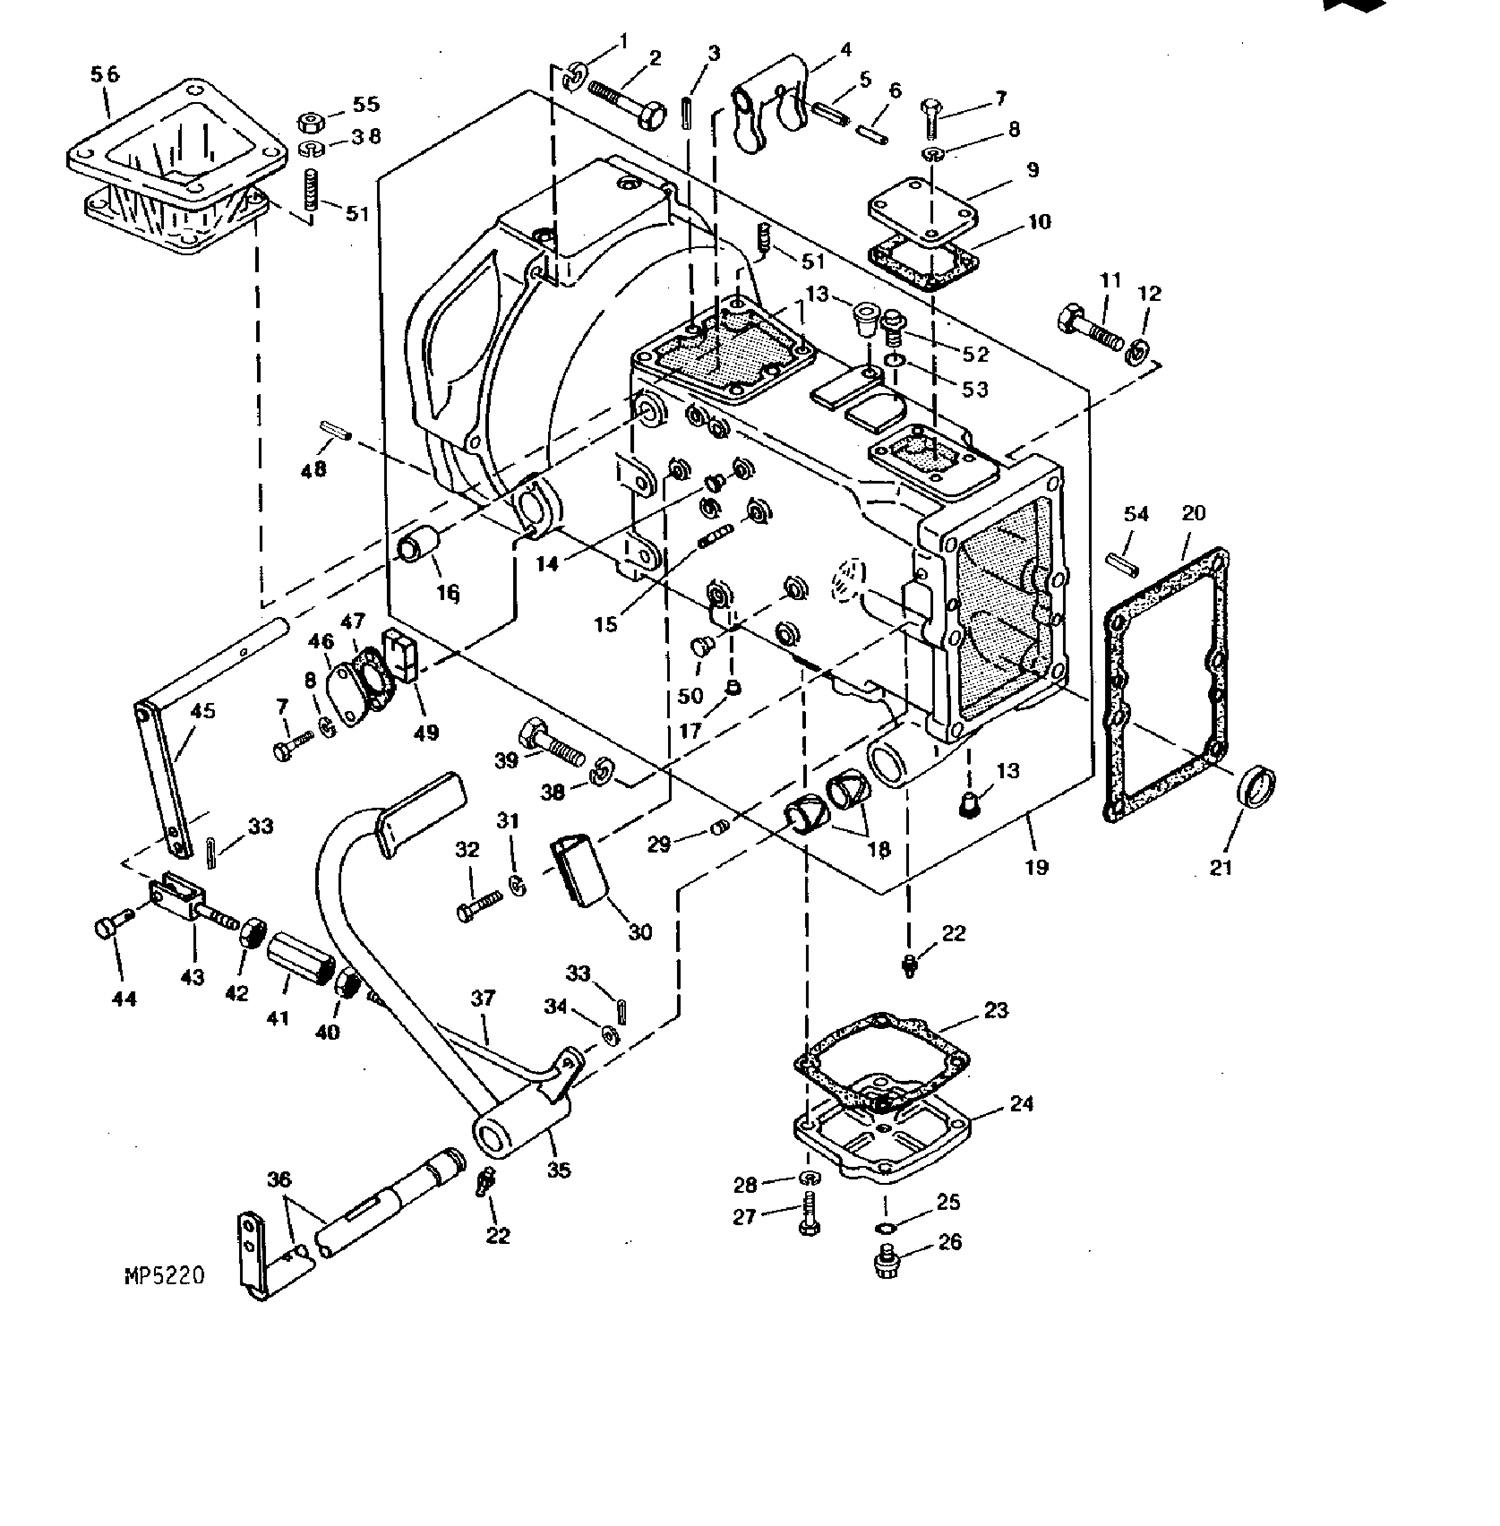 Clutch Parts For John Deere Pact Tractors. Clutch Rod End Rh Thread. John Deere. 750 John Deere Schematics At Scoala.co